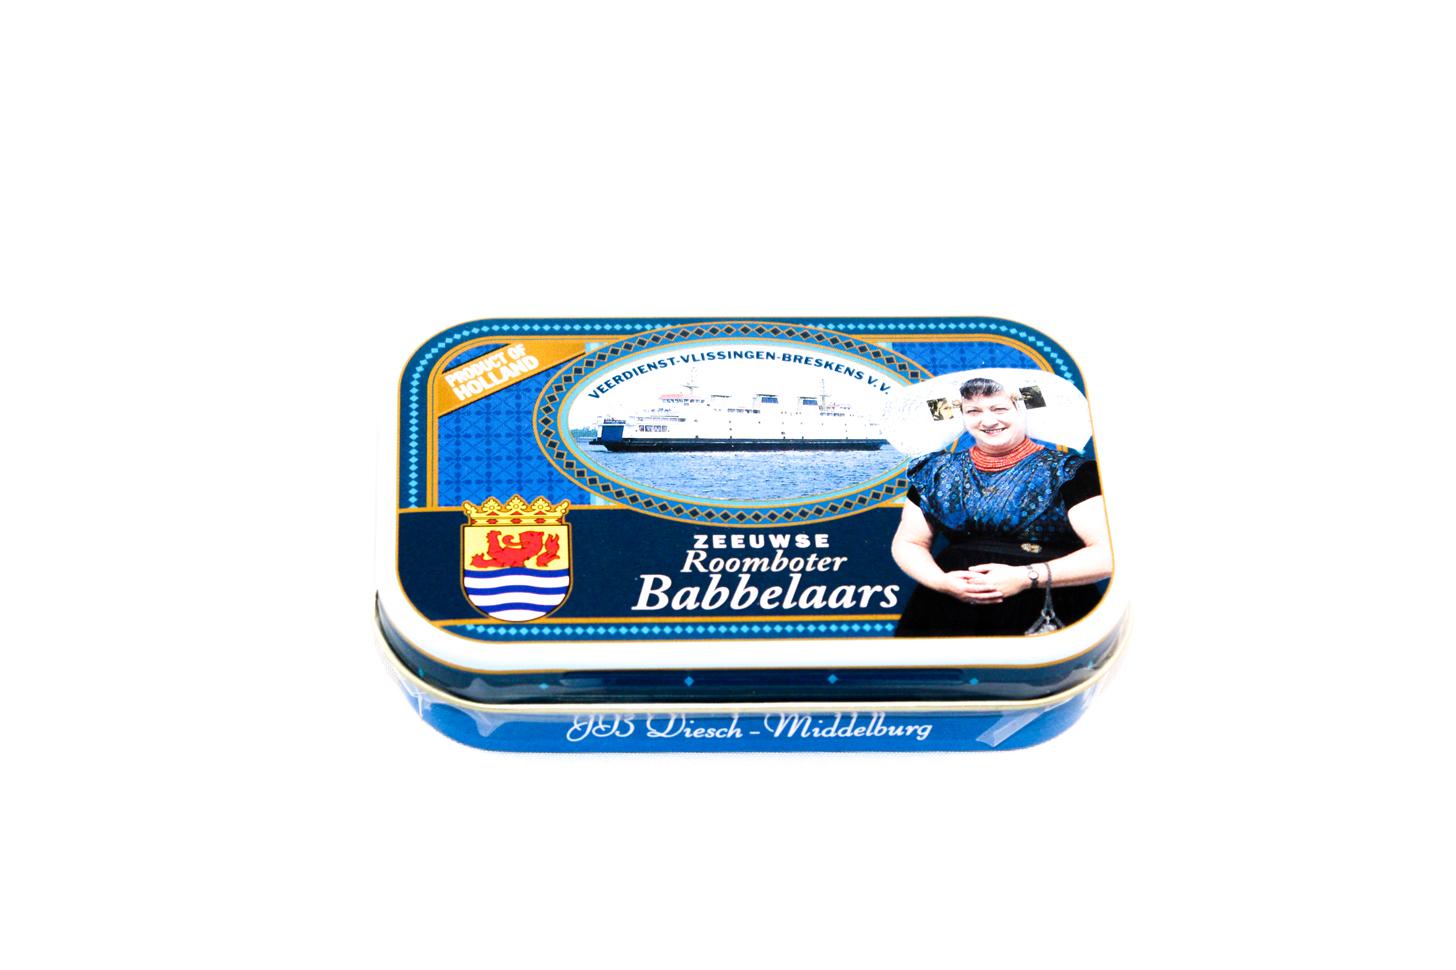 Pocketblikje met Babbelaars